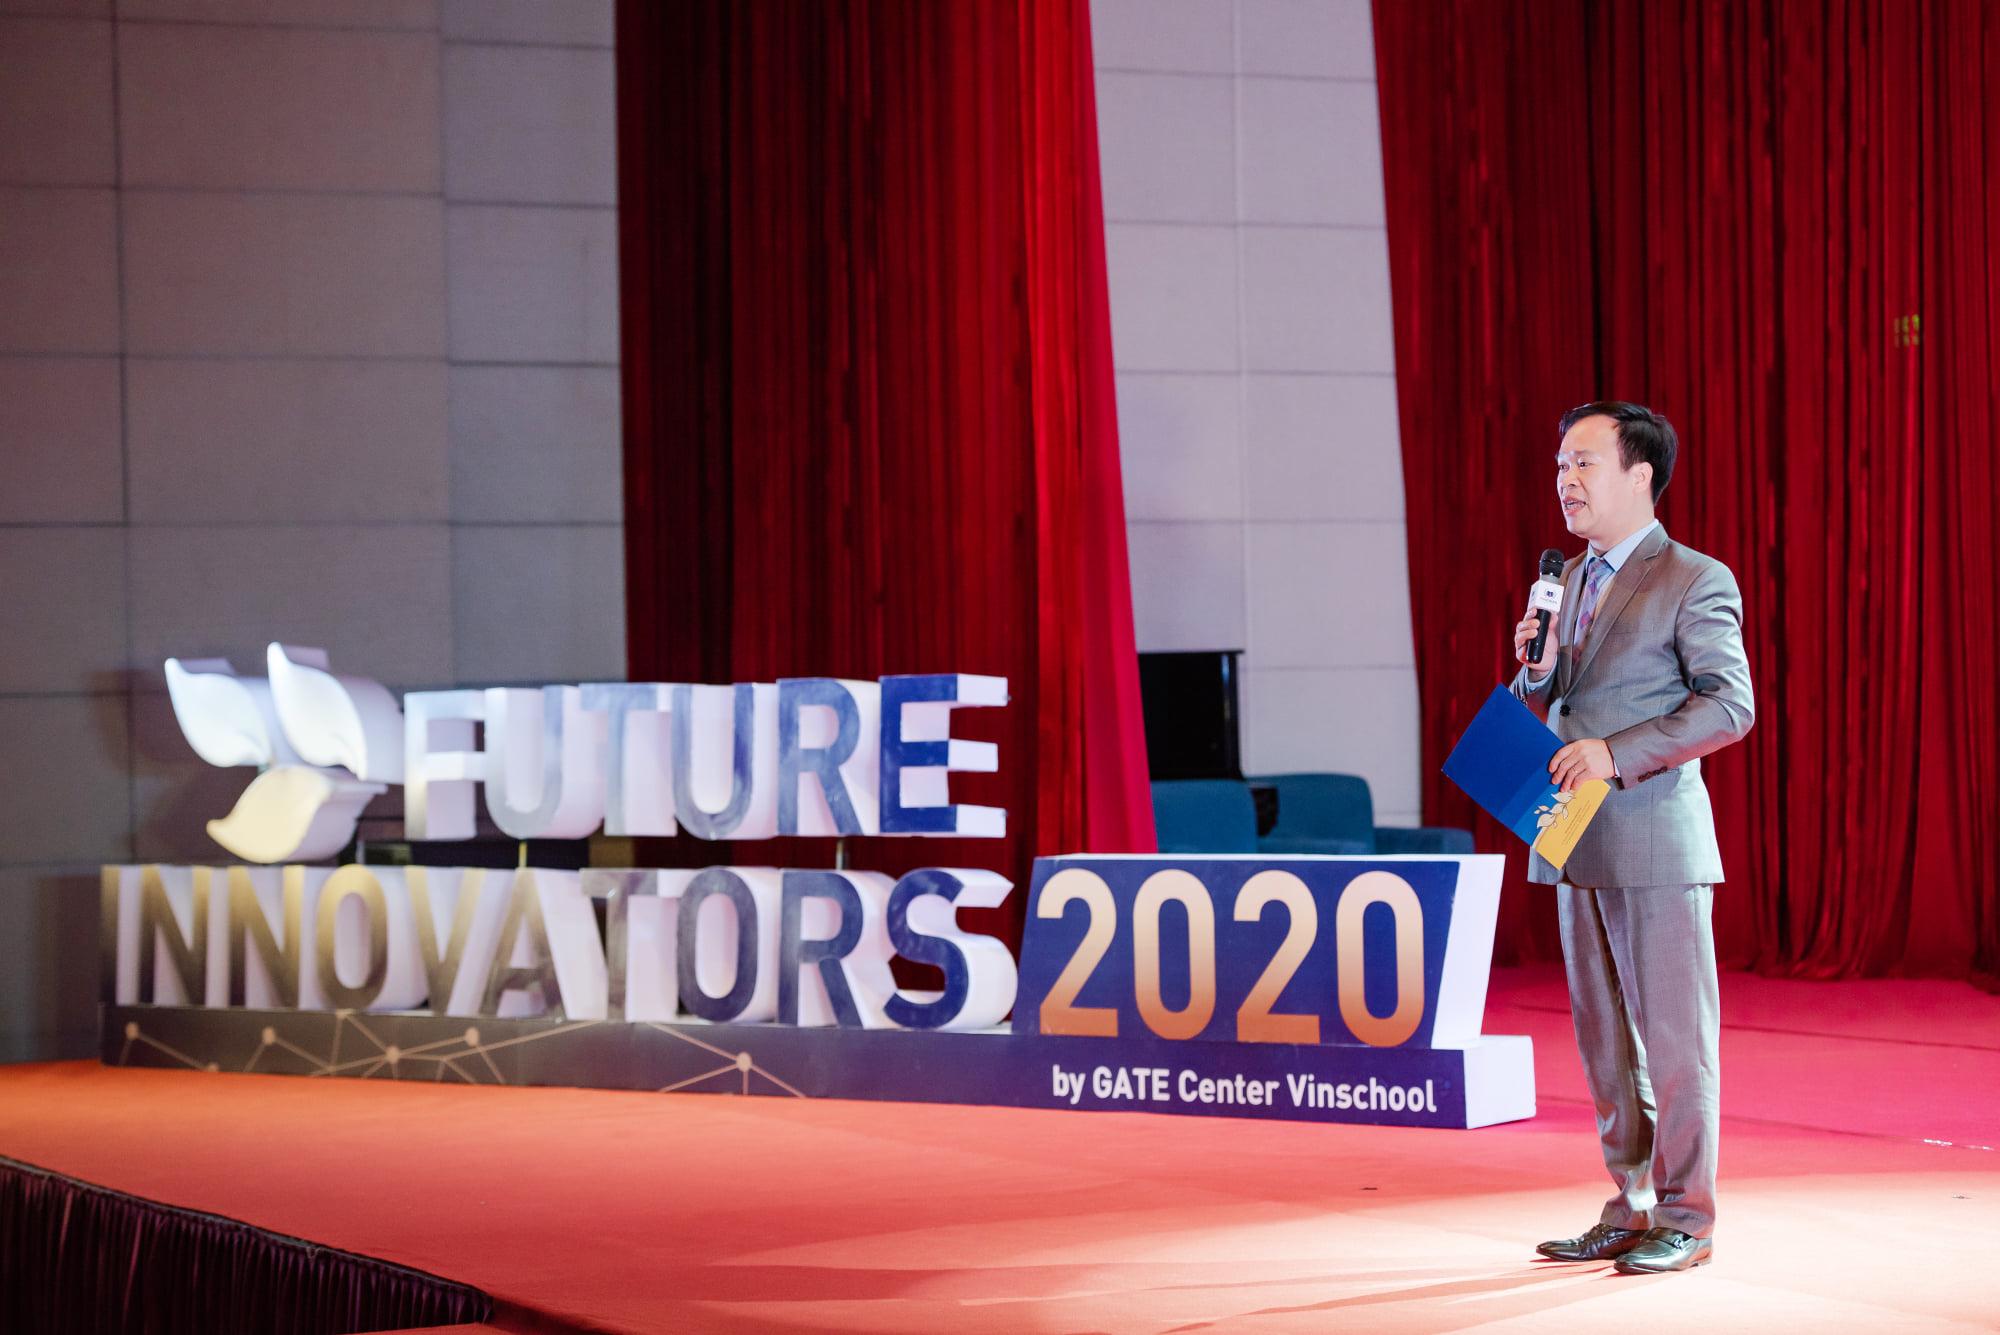 Lễ khai mạc Cuộc thi Future Innovators 2020